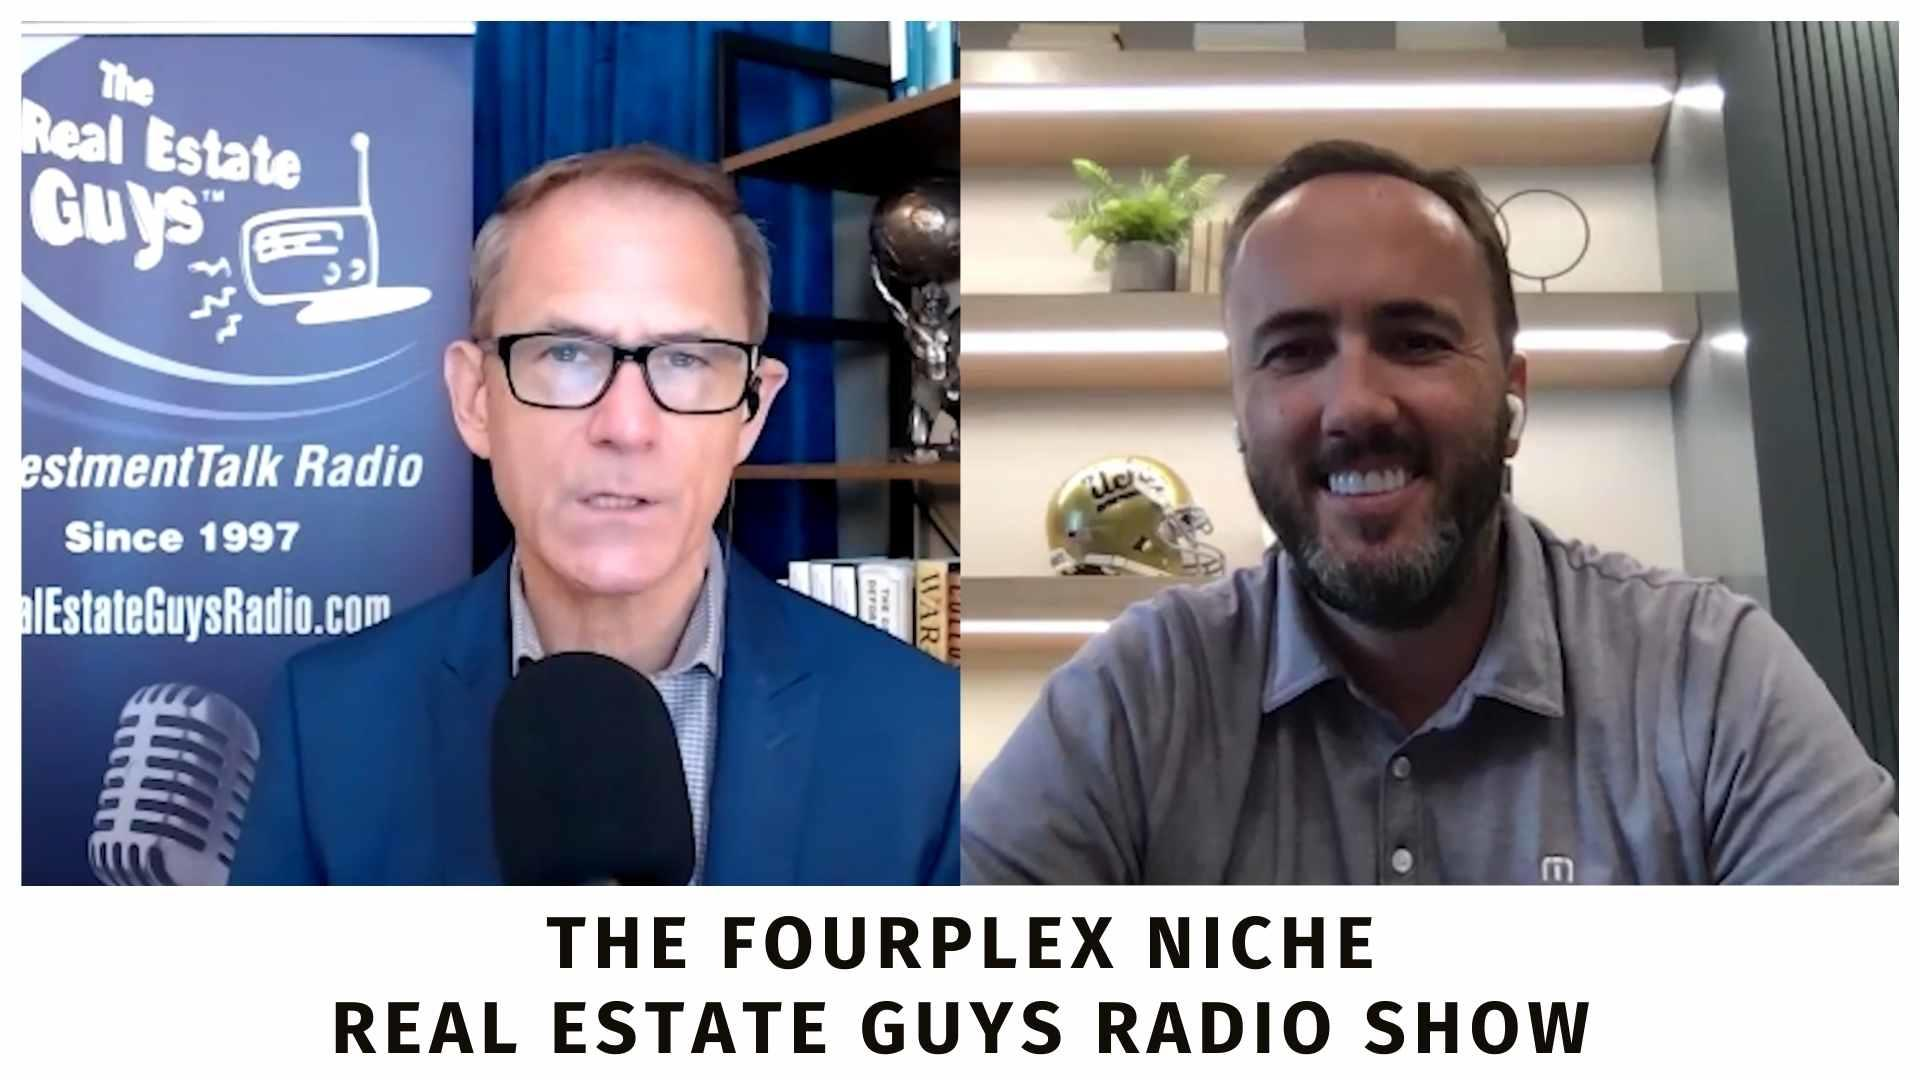 Steve Olson on the Real Estate Guys Radio Show